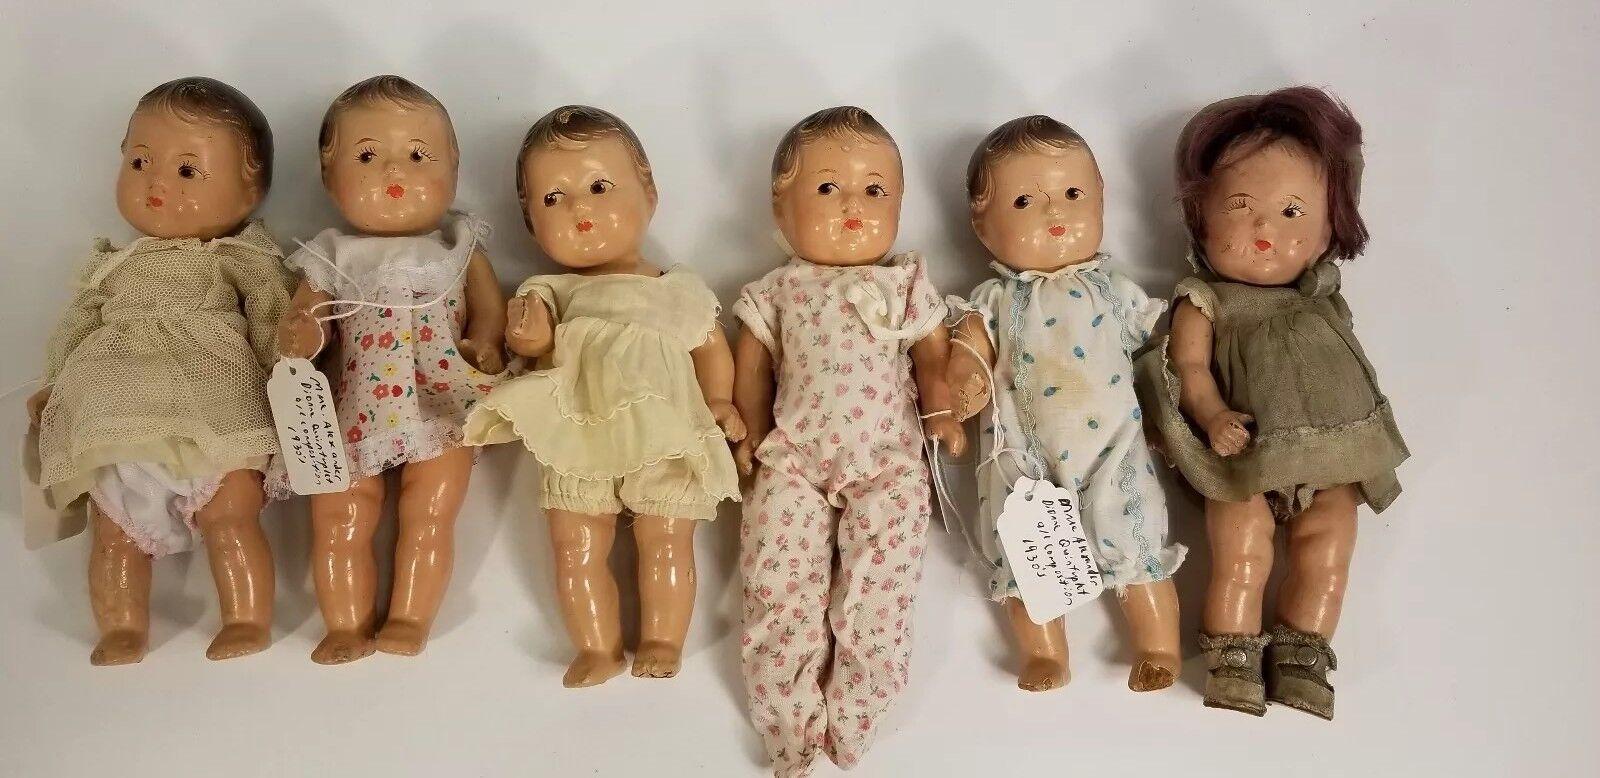 Vintage 1930s Madame Alexander Composition Dionne Quintuplets Baby Doll Set 8in